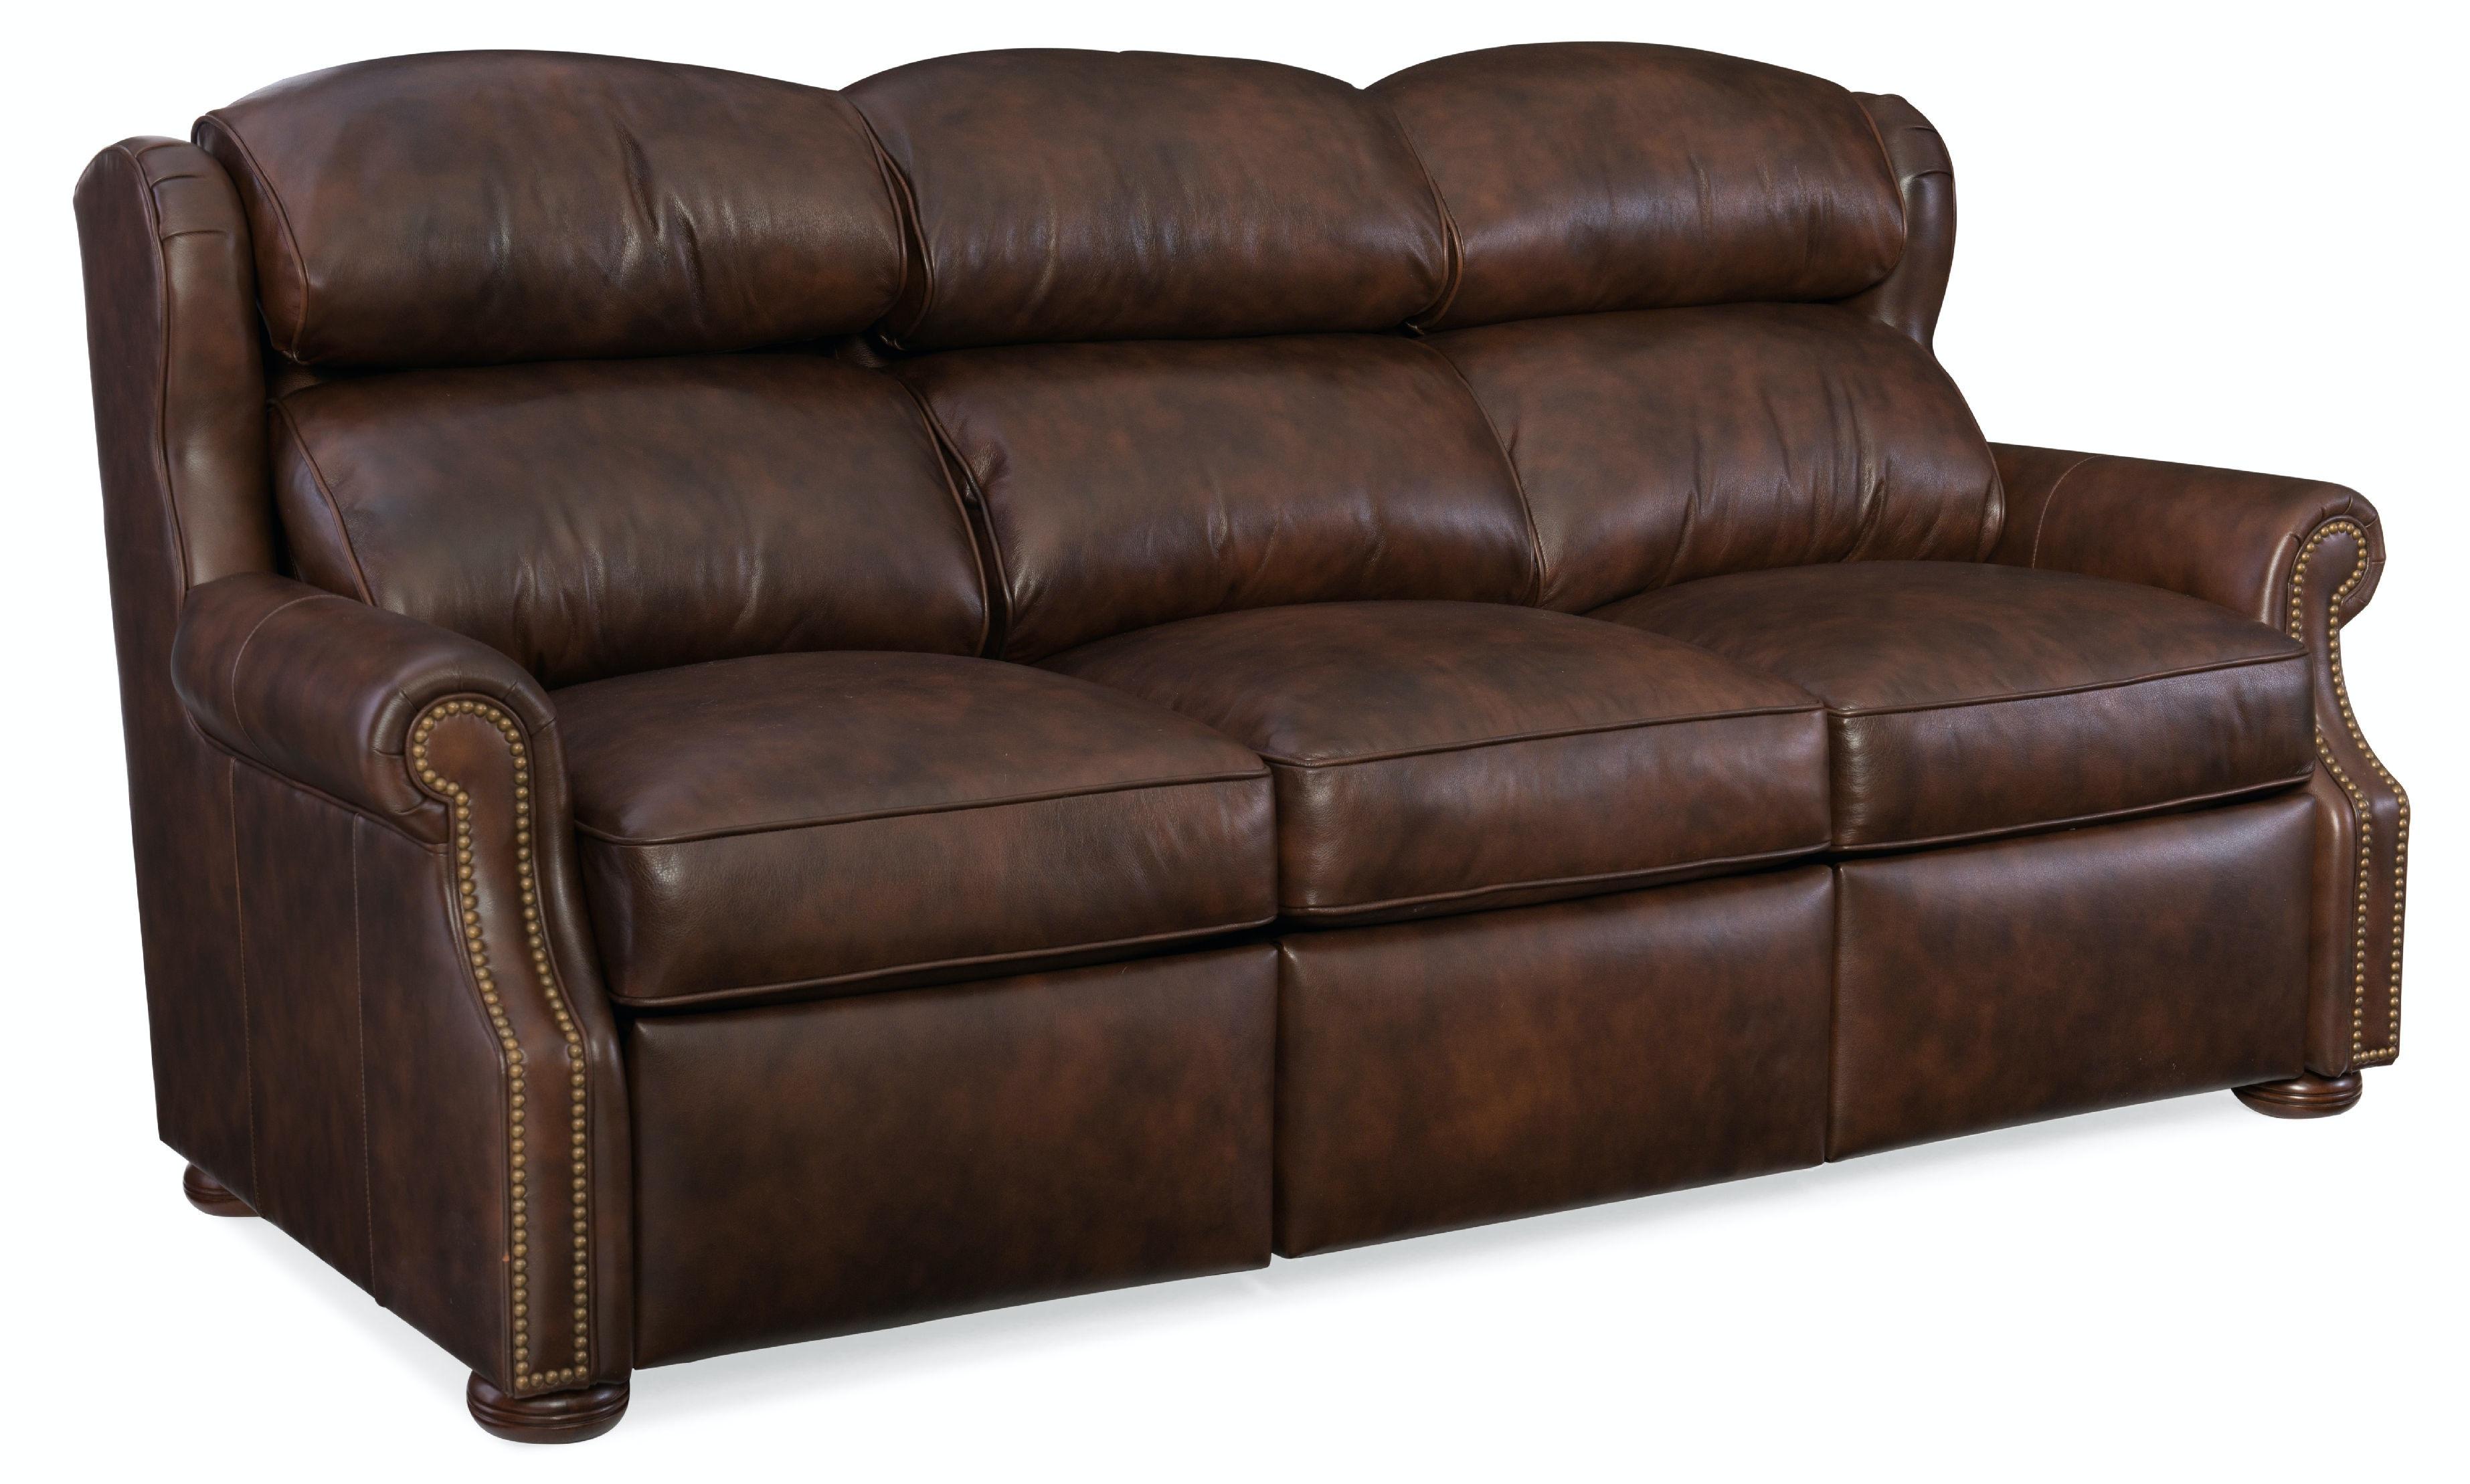 Bradington Young Furniture Armando Sofa   Full Recline At Both Arms 930 90